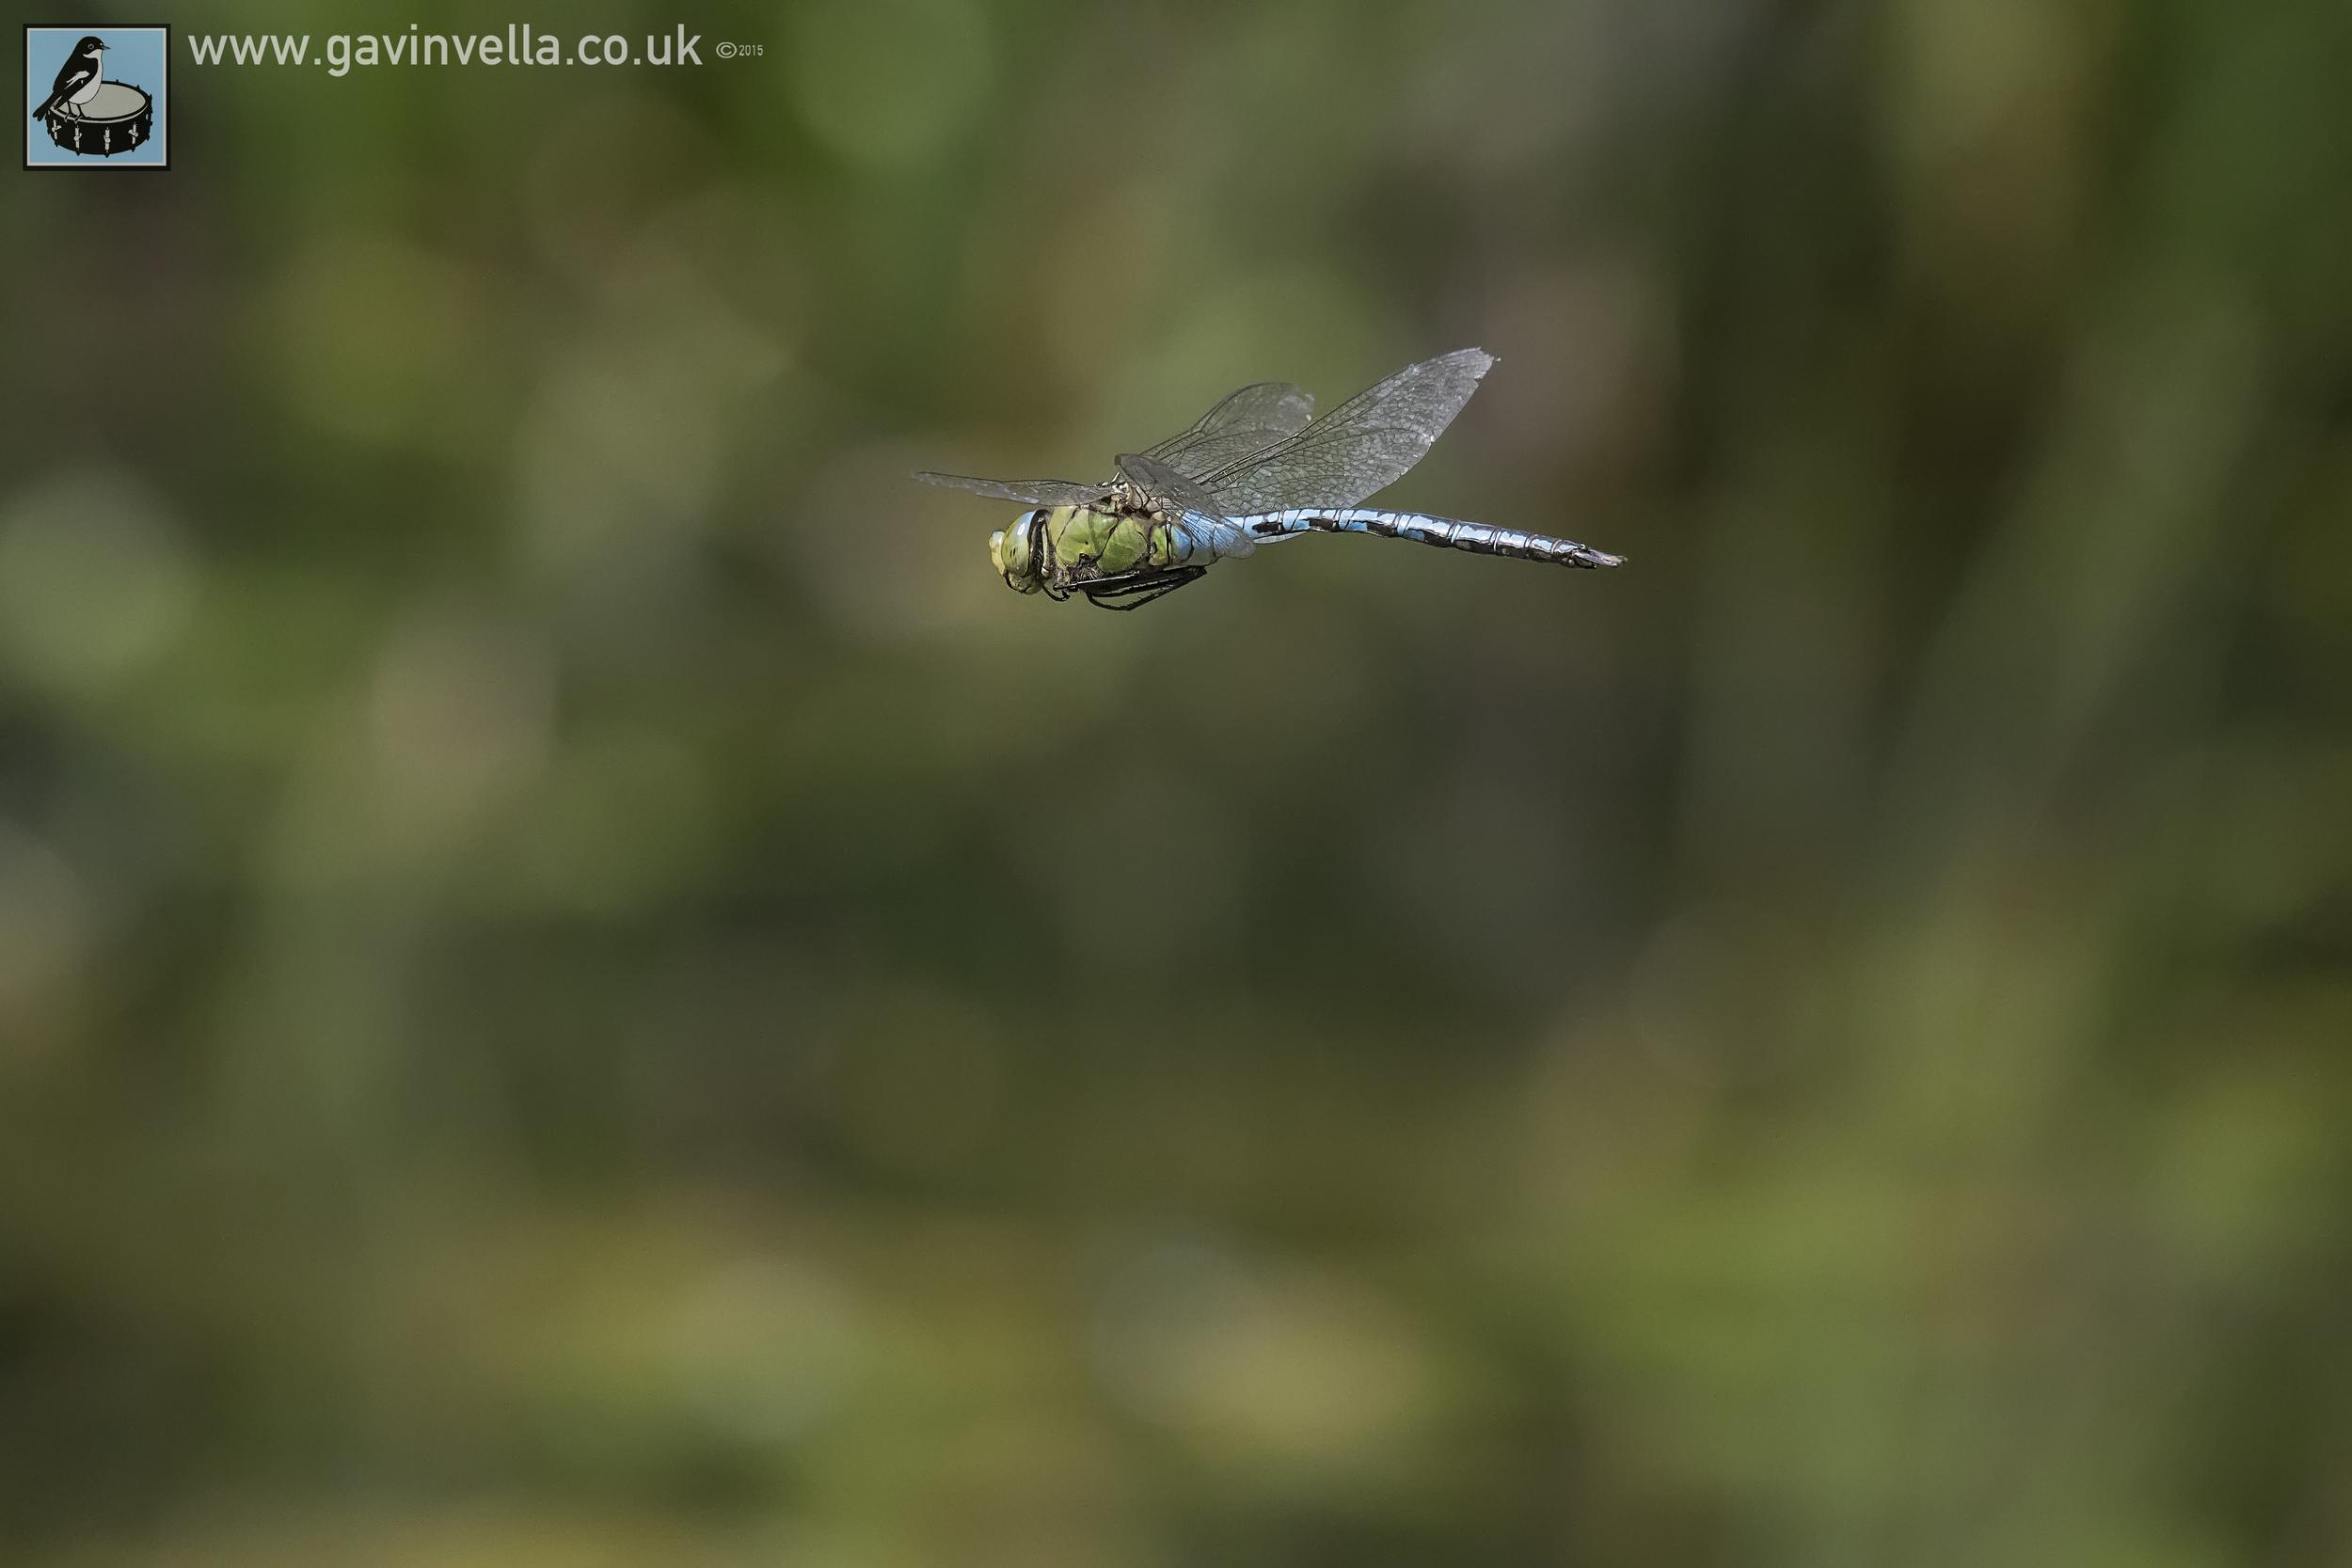 Emperor Dragonfly Full Frame 17th July copy.jpg